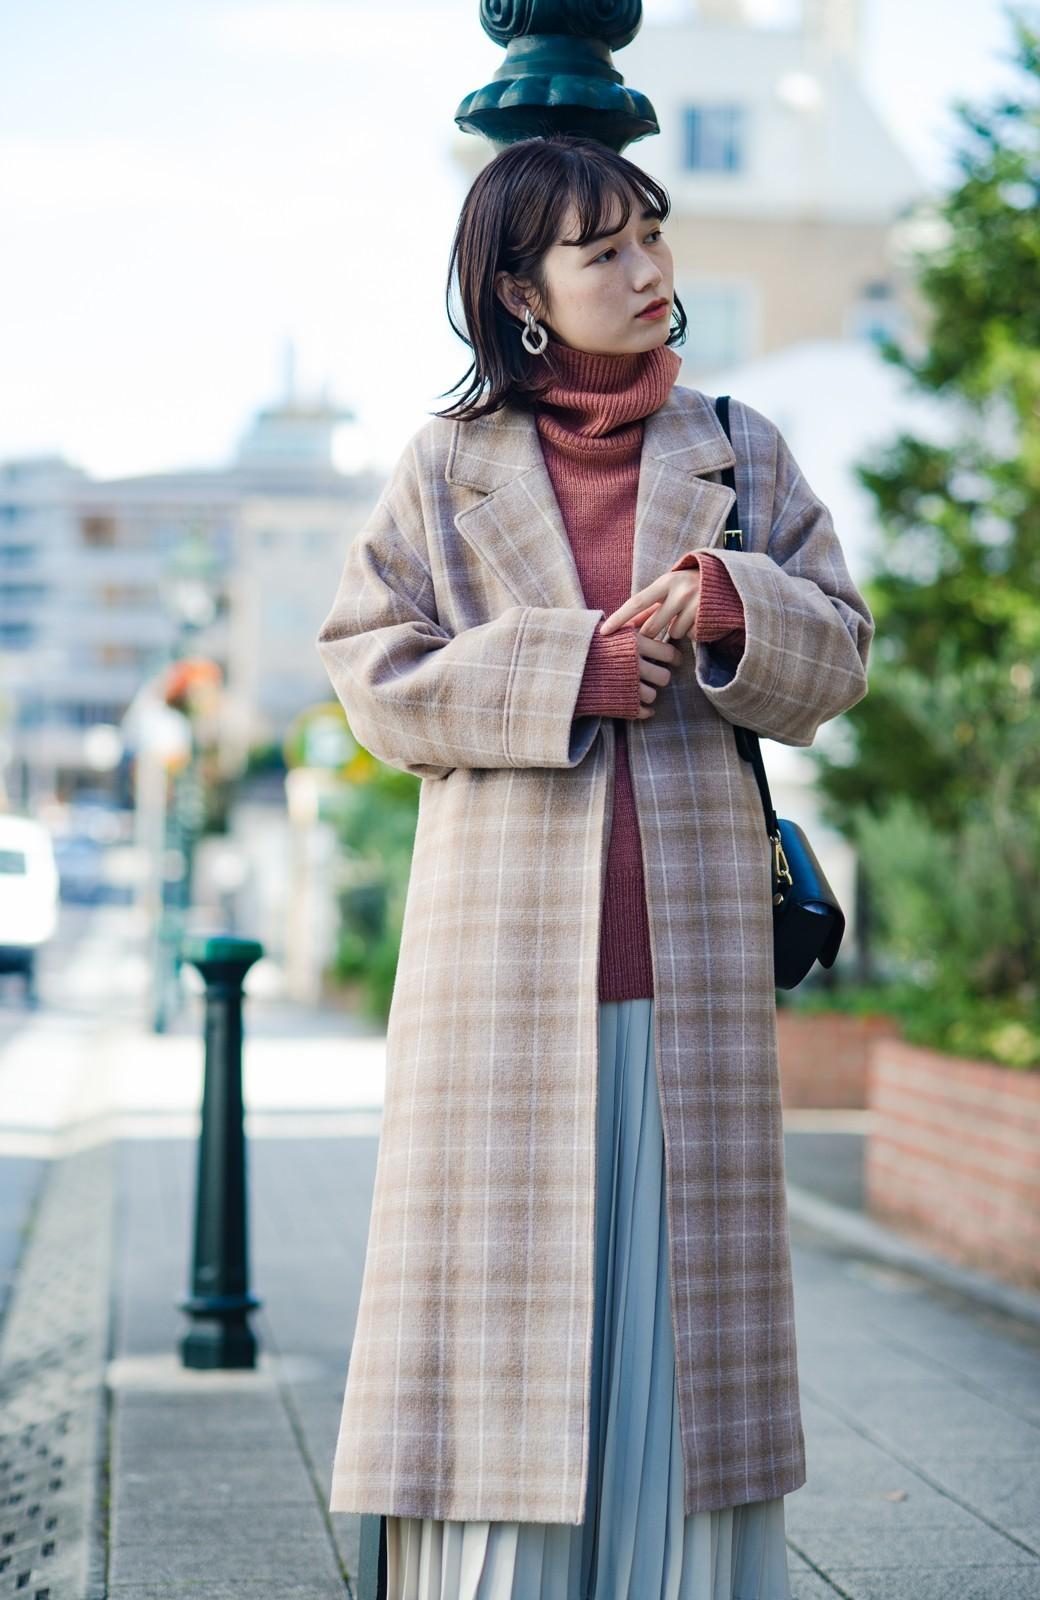 haco! パッと羽織るだけで様になる!カジュアルにも大人っぽくも着られる便利なチェックコート <ベージュ系その他>の商品写真1